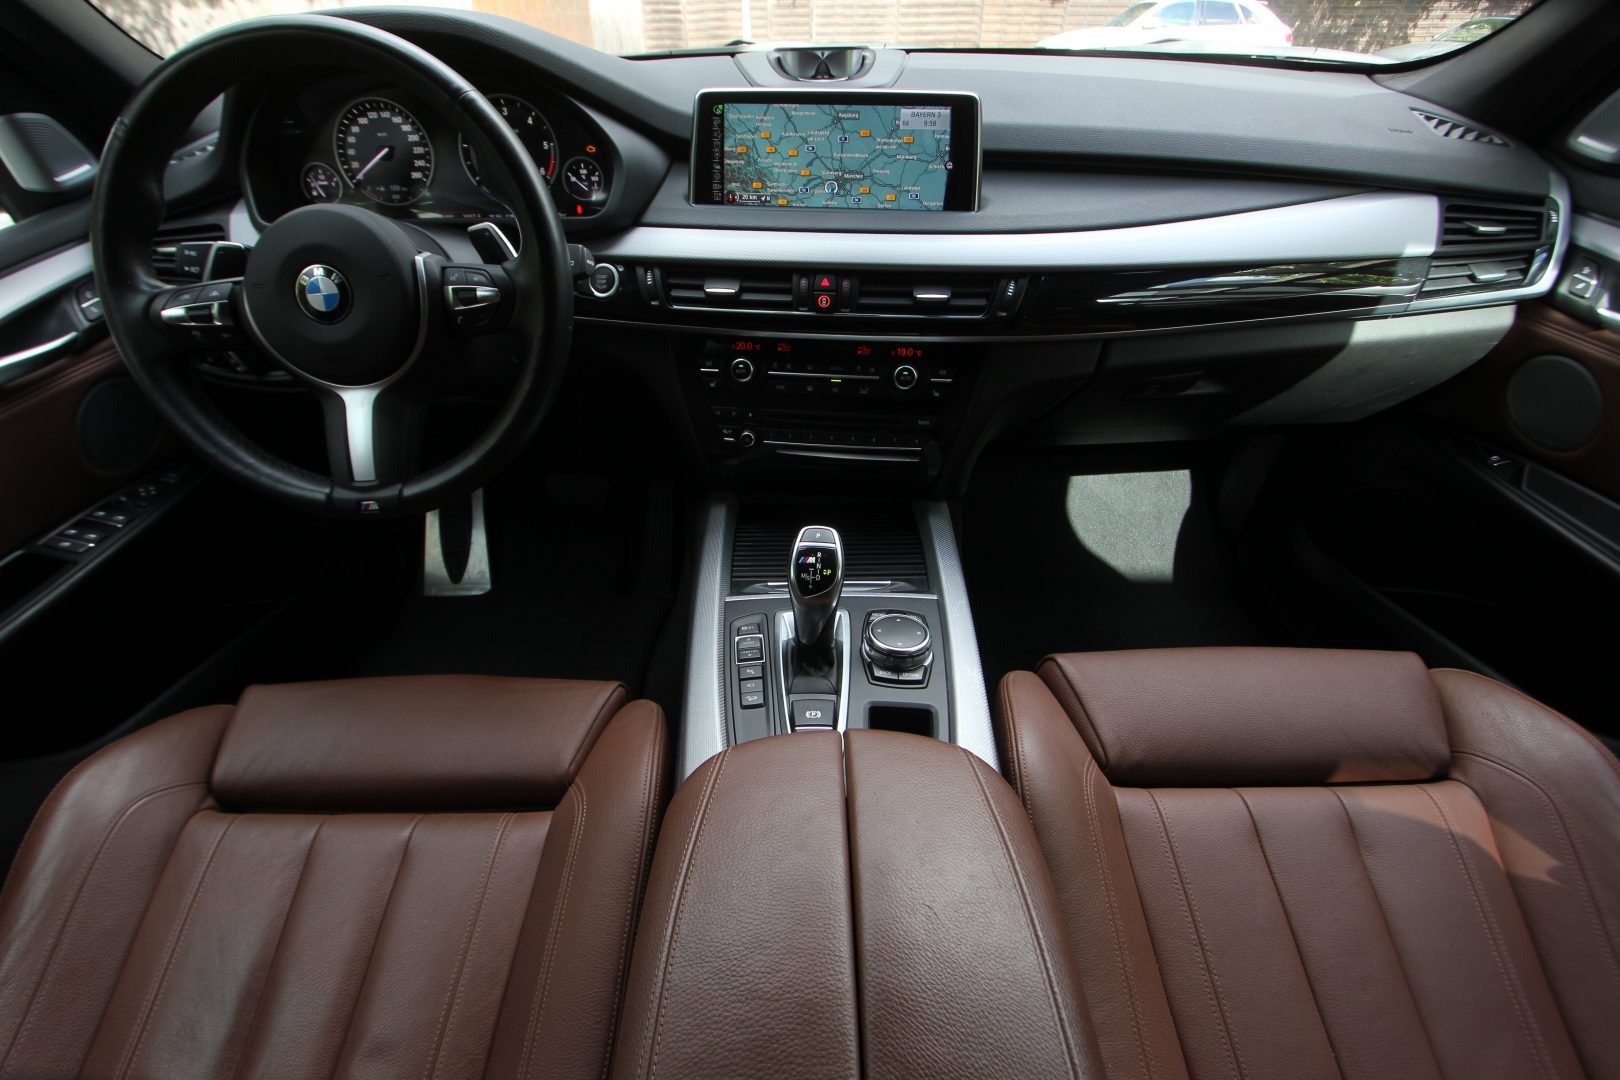 AIL BMW X5 M50d Bang & Olufsen Panorama RSE 17